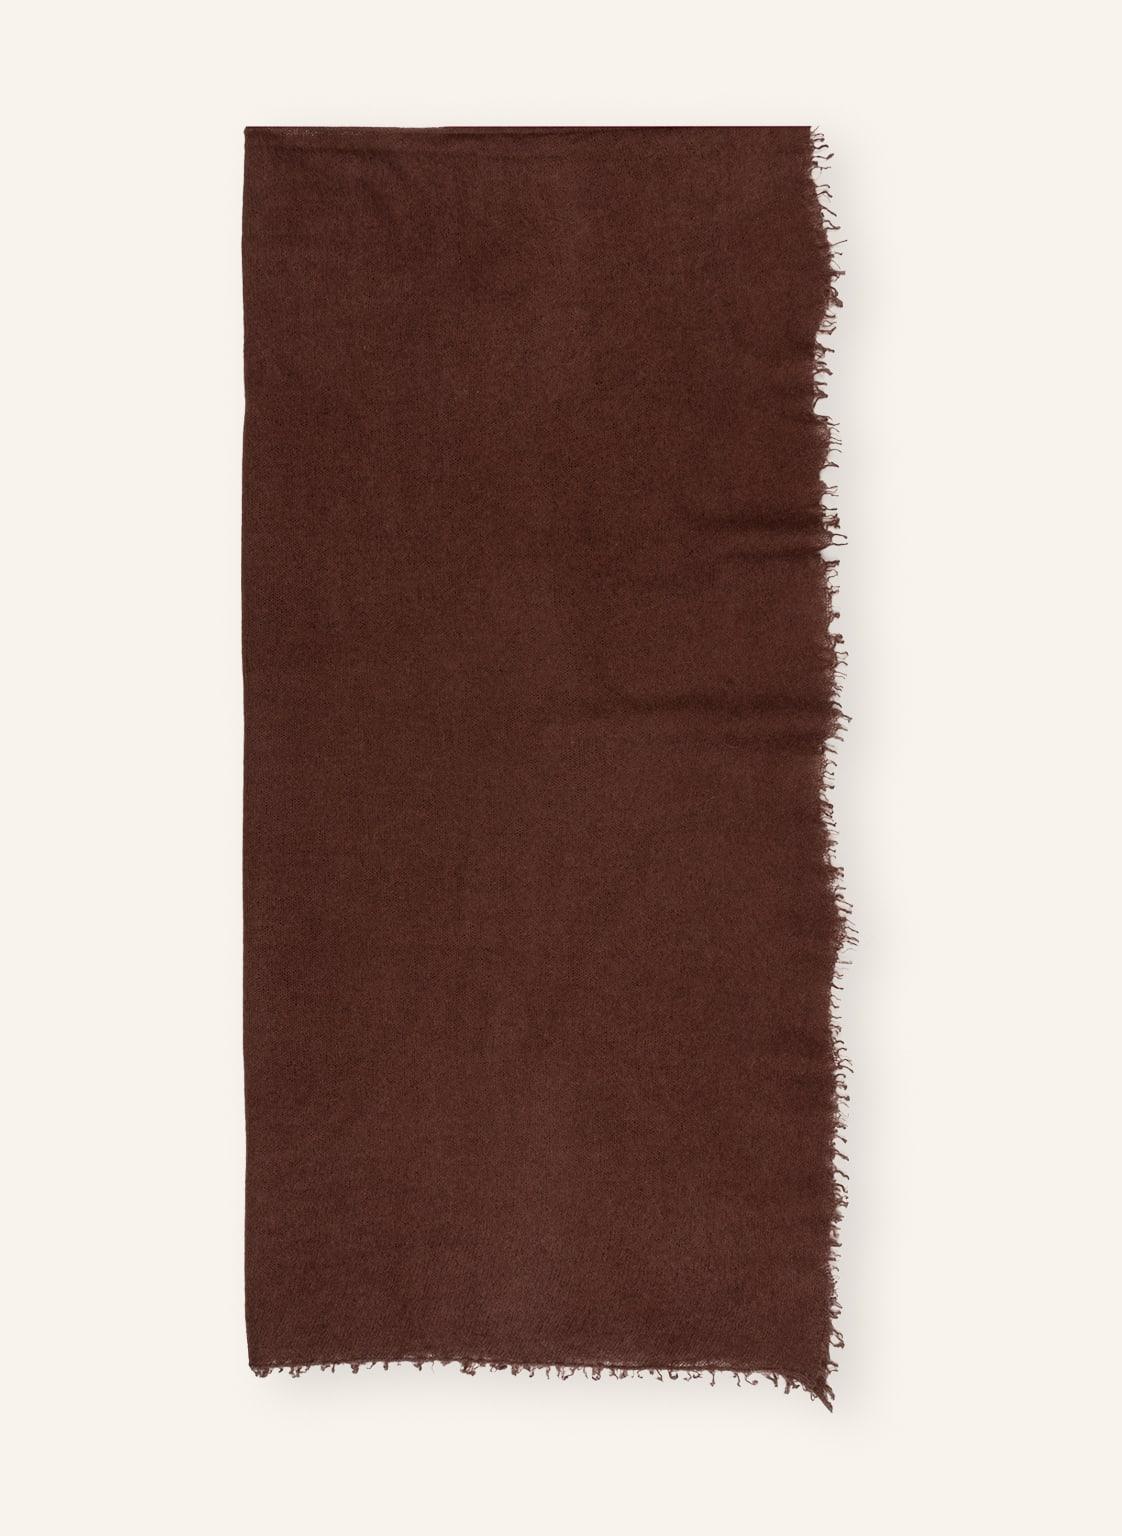 Image of Bakaree Cashmere-Schal braun